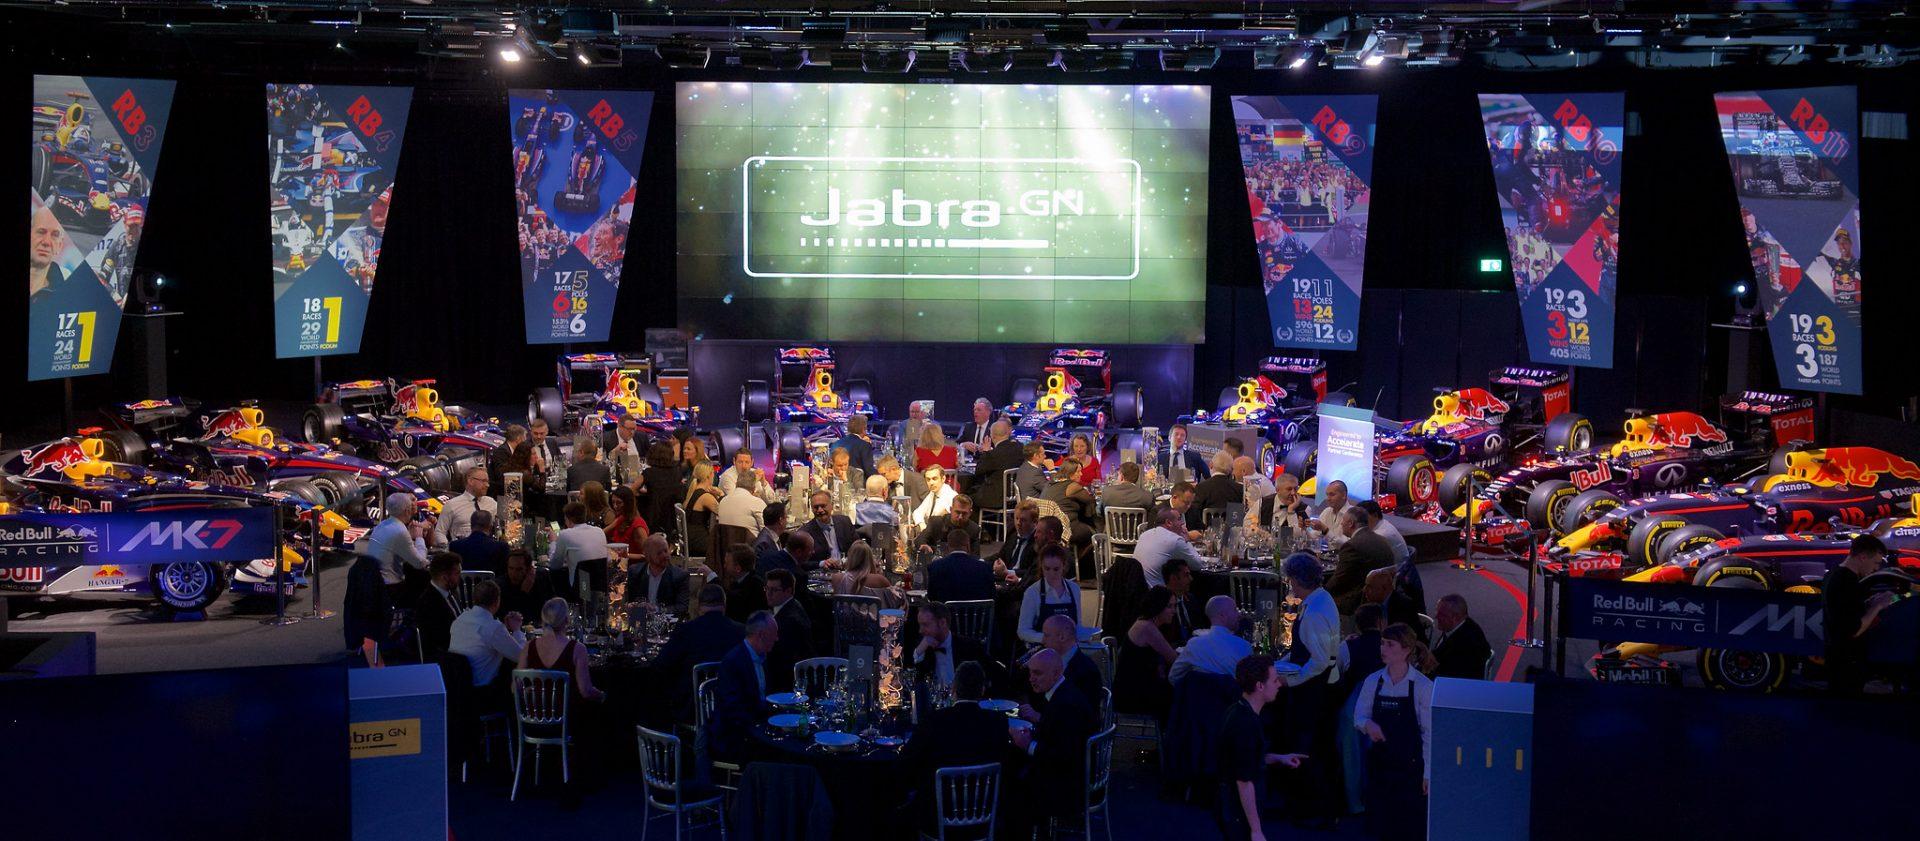 i 6Phs7tF X4 - UK&I Channel Partner Conference & Awards Dinner